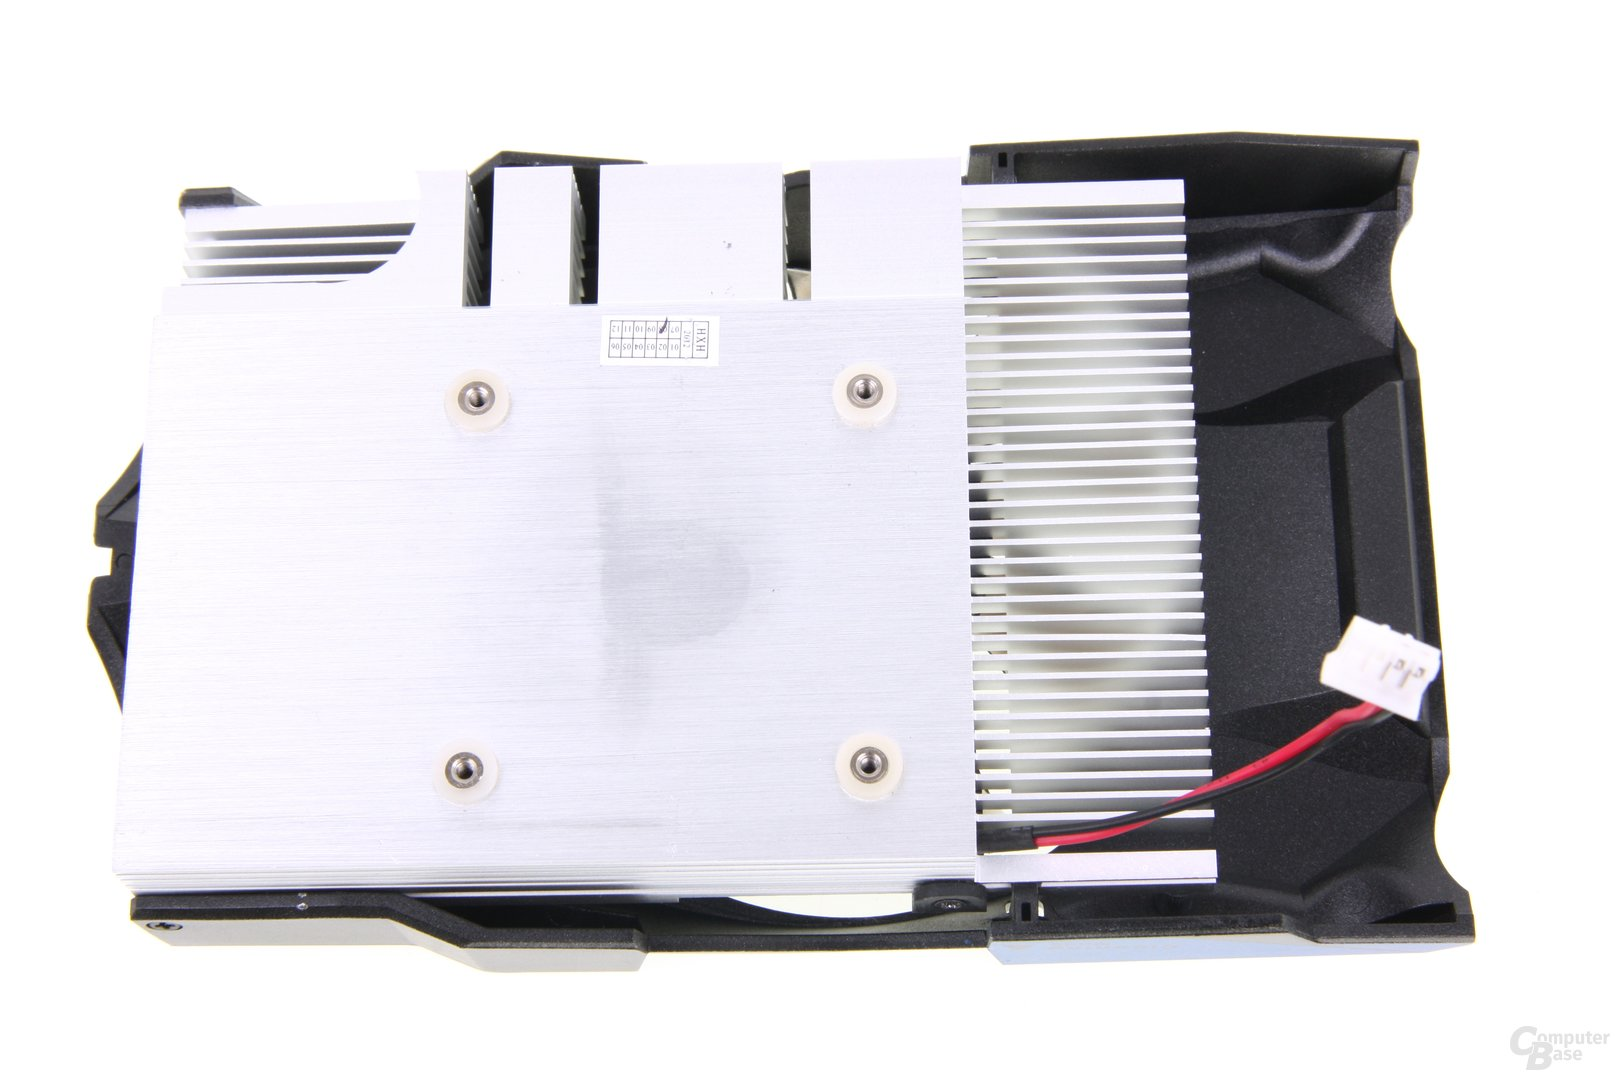 GeForce GTX 650 OC EX Kühlerrückseite